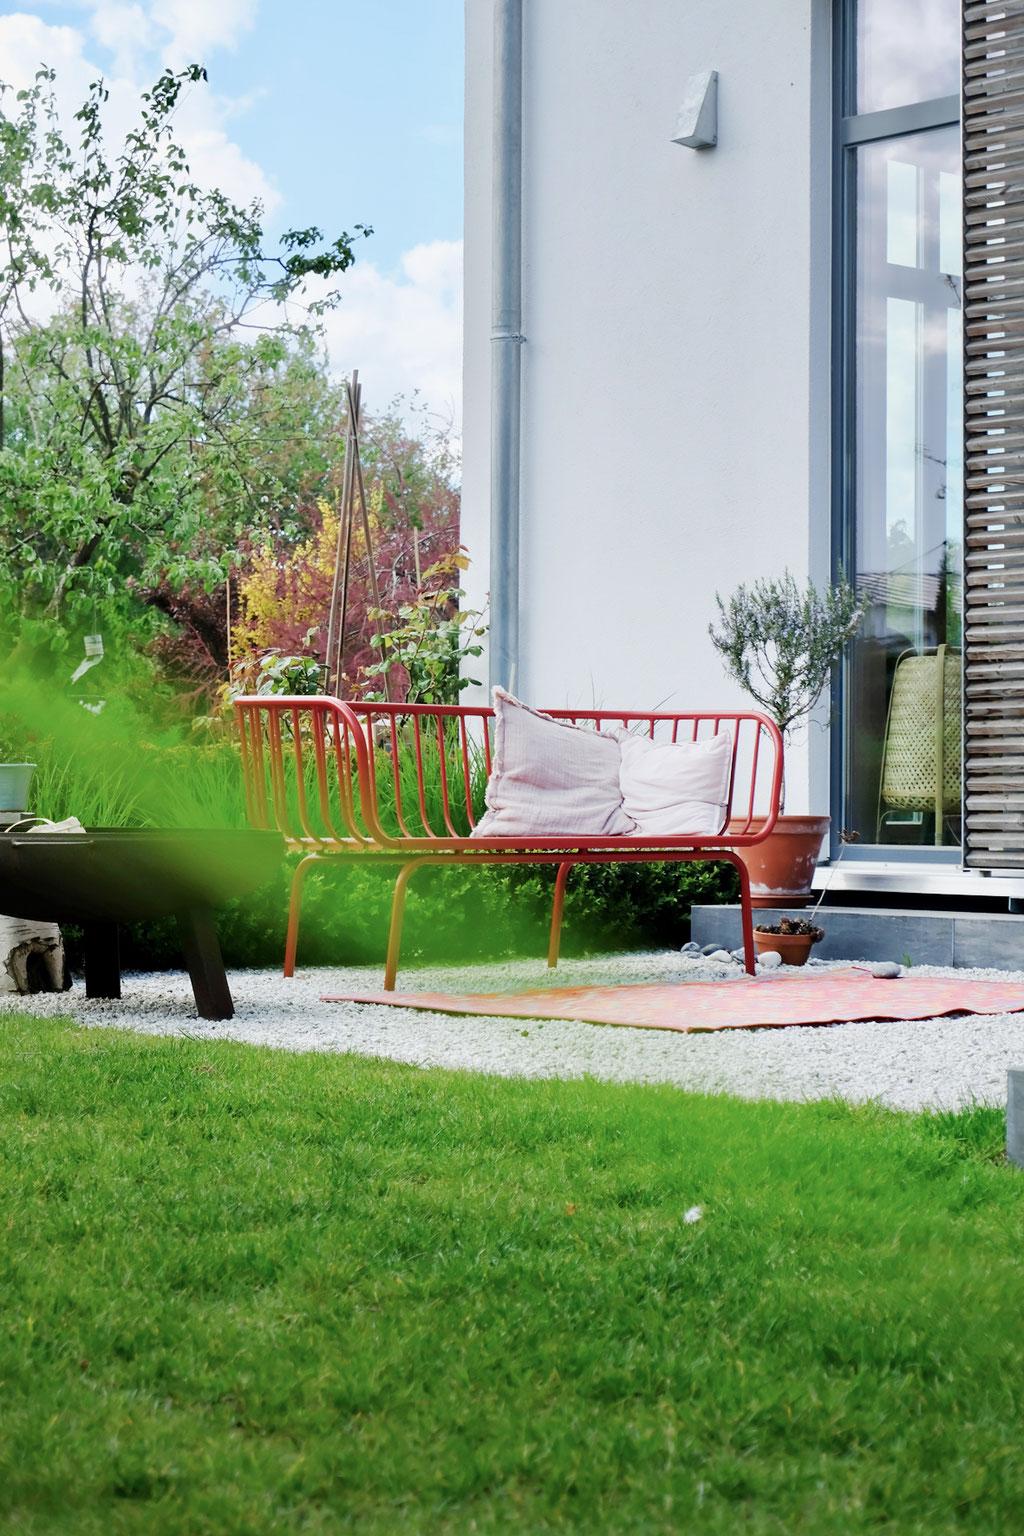 dieartigeGARTEN - Neu: das Garten-Sofa von IKEA